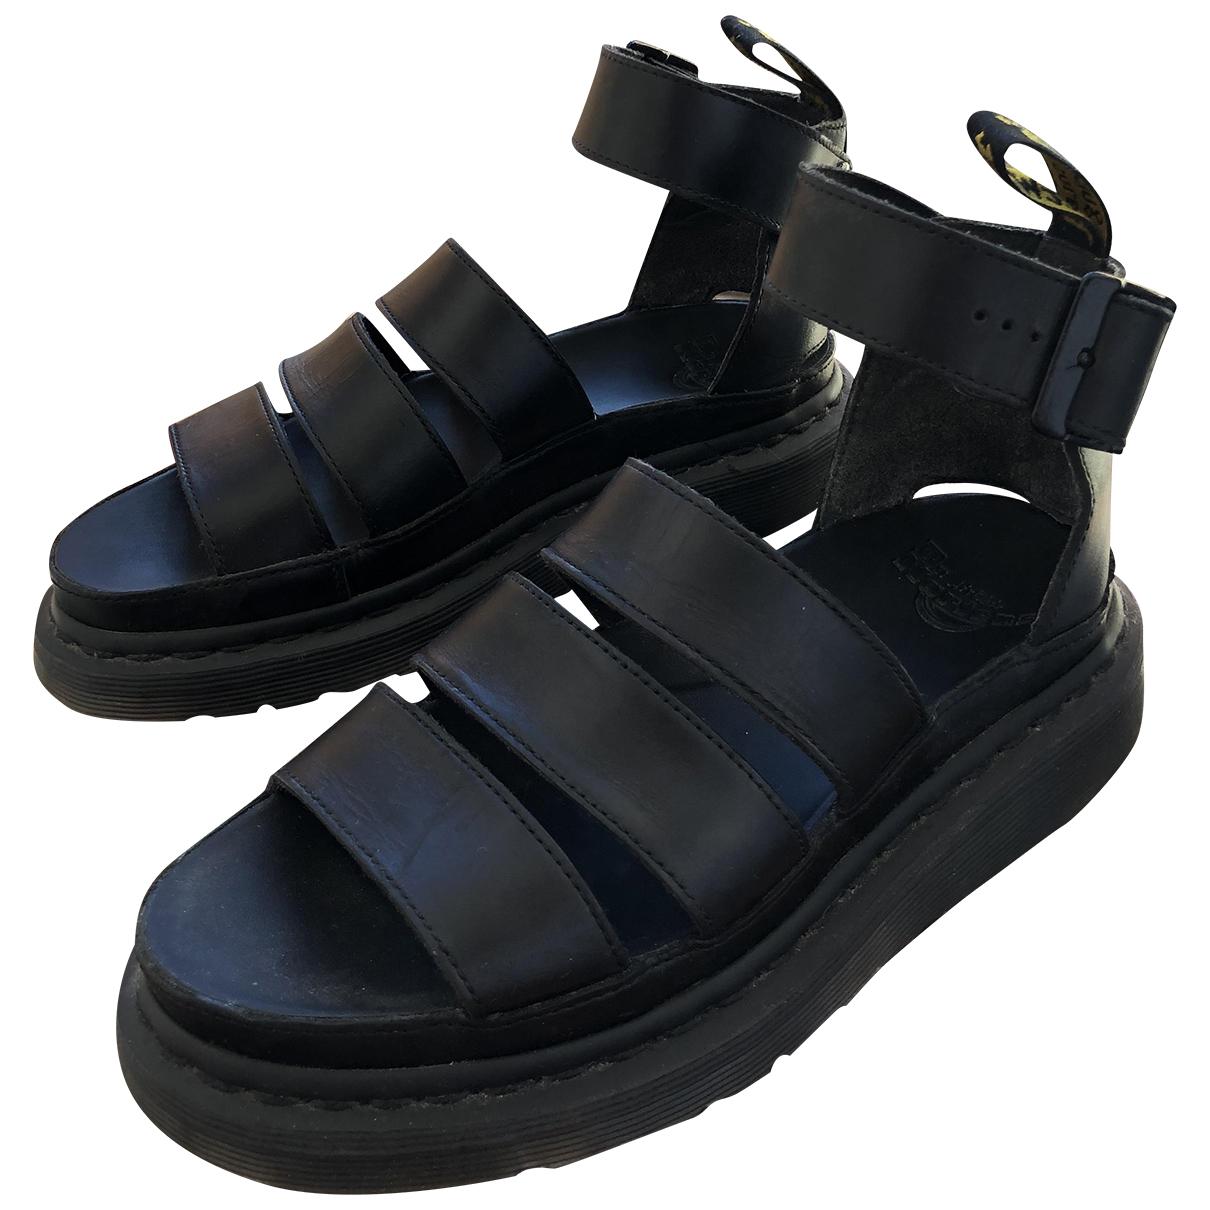 Sandalias de Cuero Dr. Martens